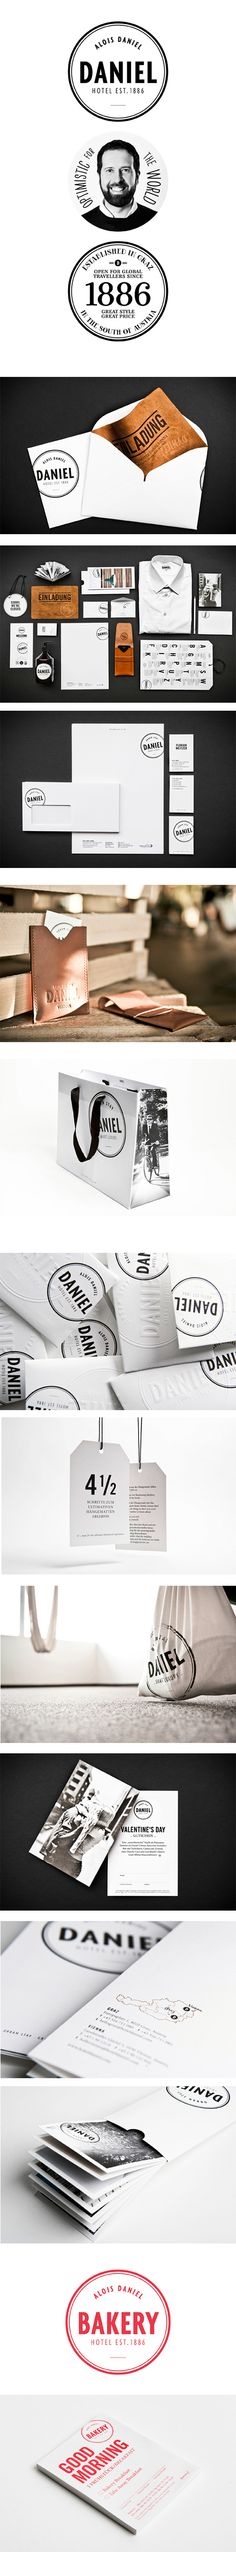 Typography Fonts, Lettering, Graphic Design Layouts, Layout Design, Identity Design, Brand Identity, Creative Box, Brand Fonts, Envelope Design